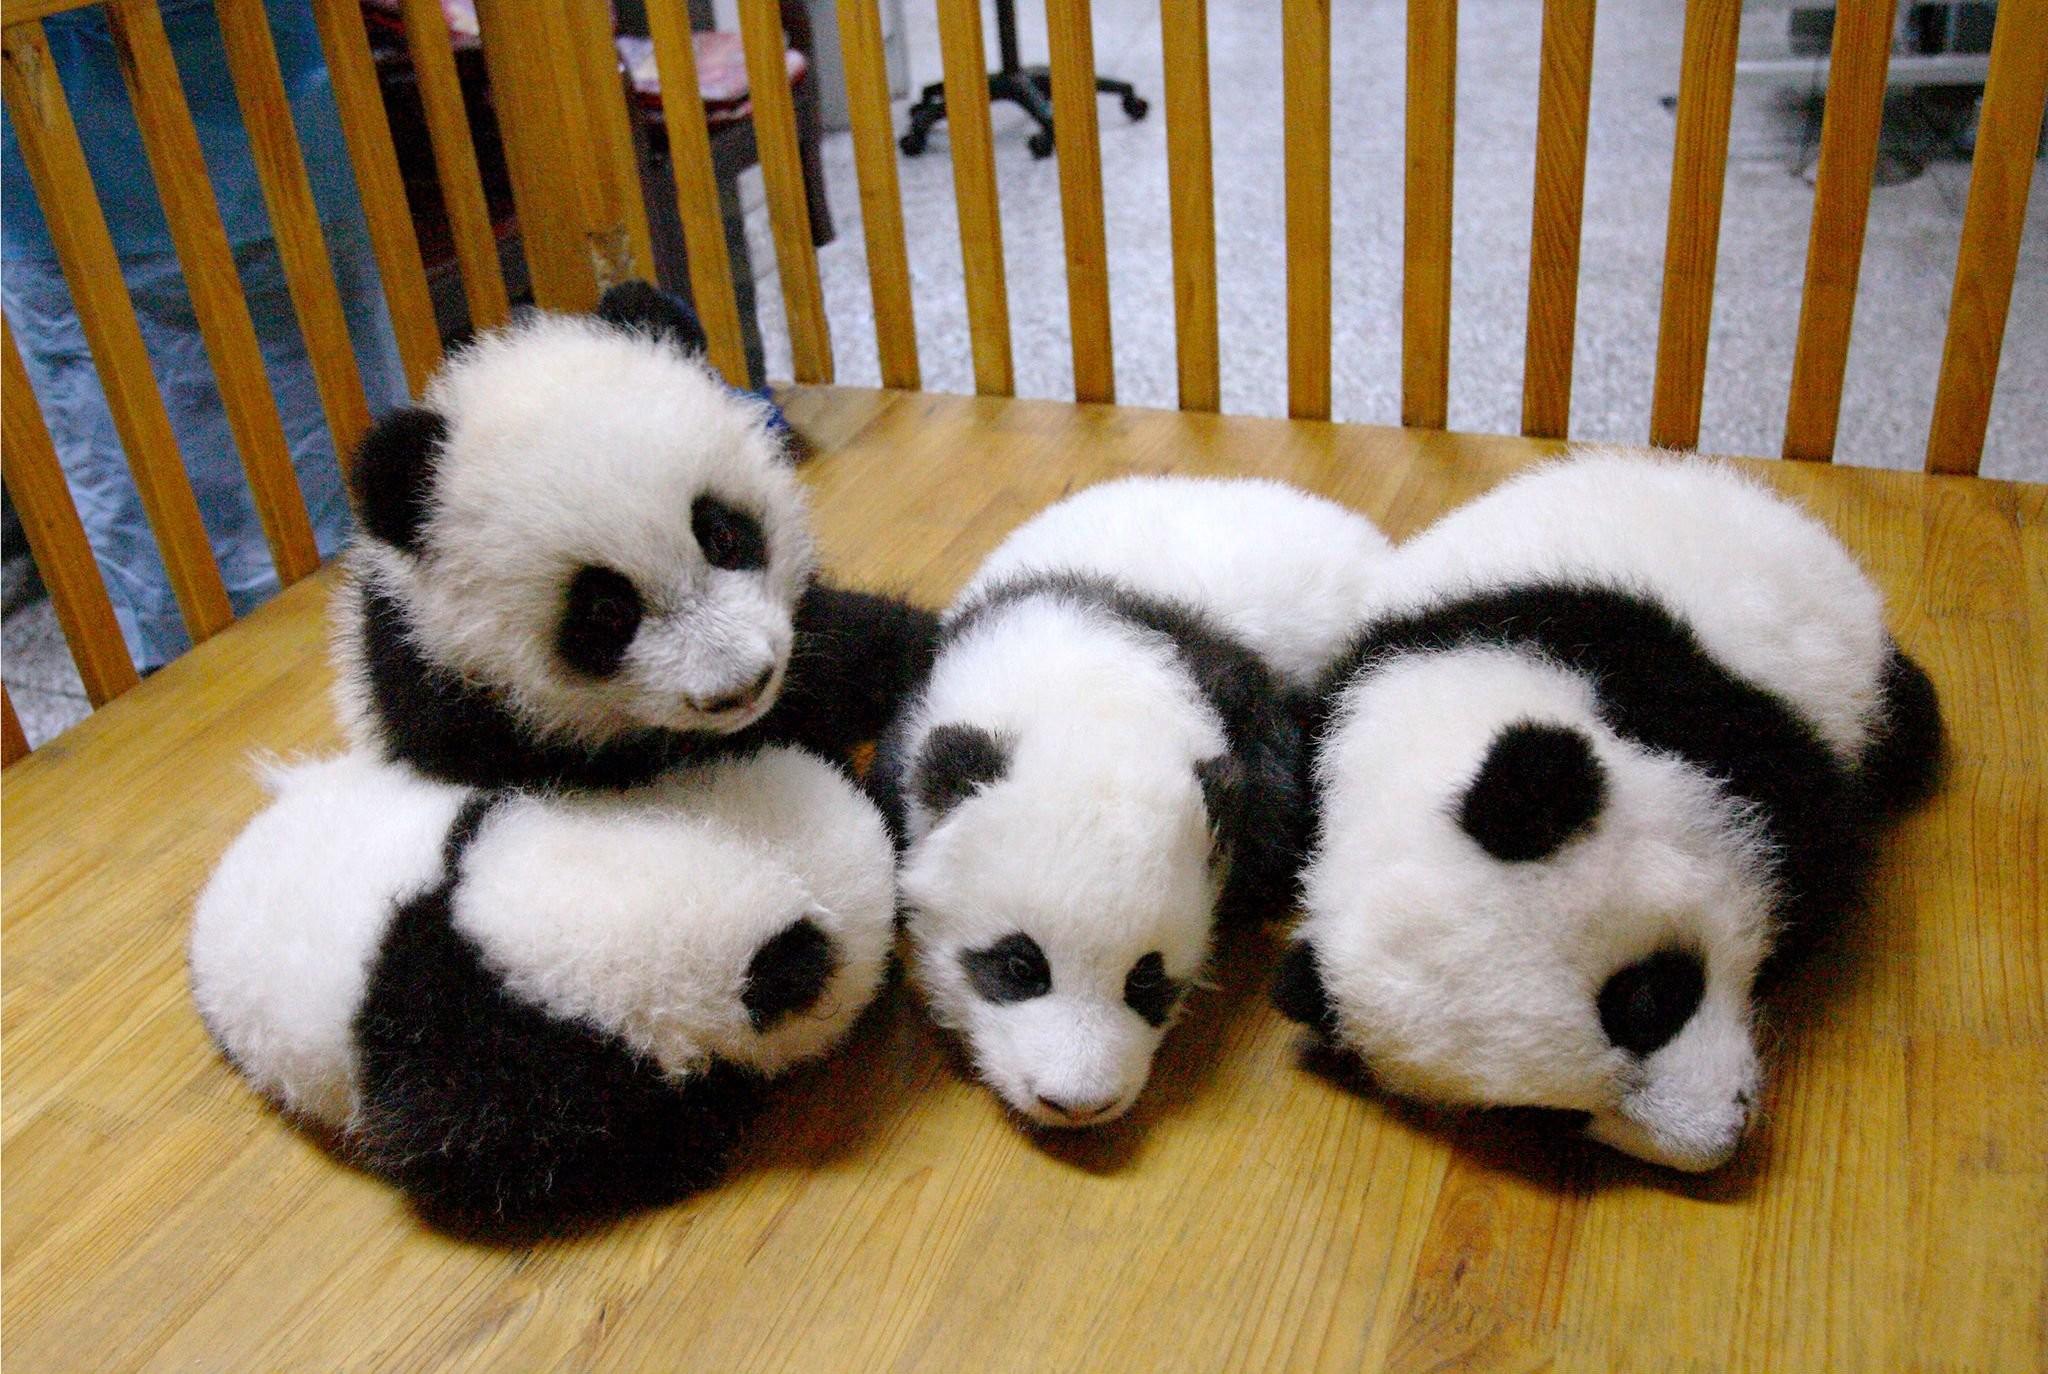 Panda pandas baer bears baby cute (29) wallpaper     364456    WallpaperUP